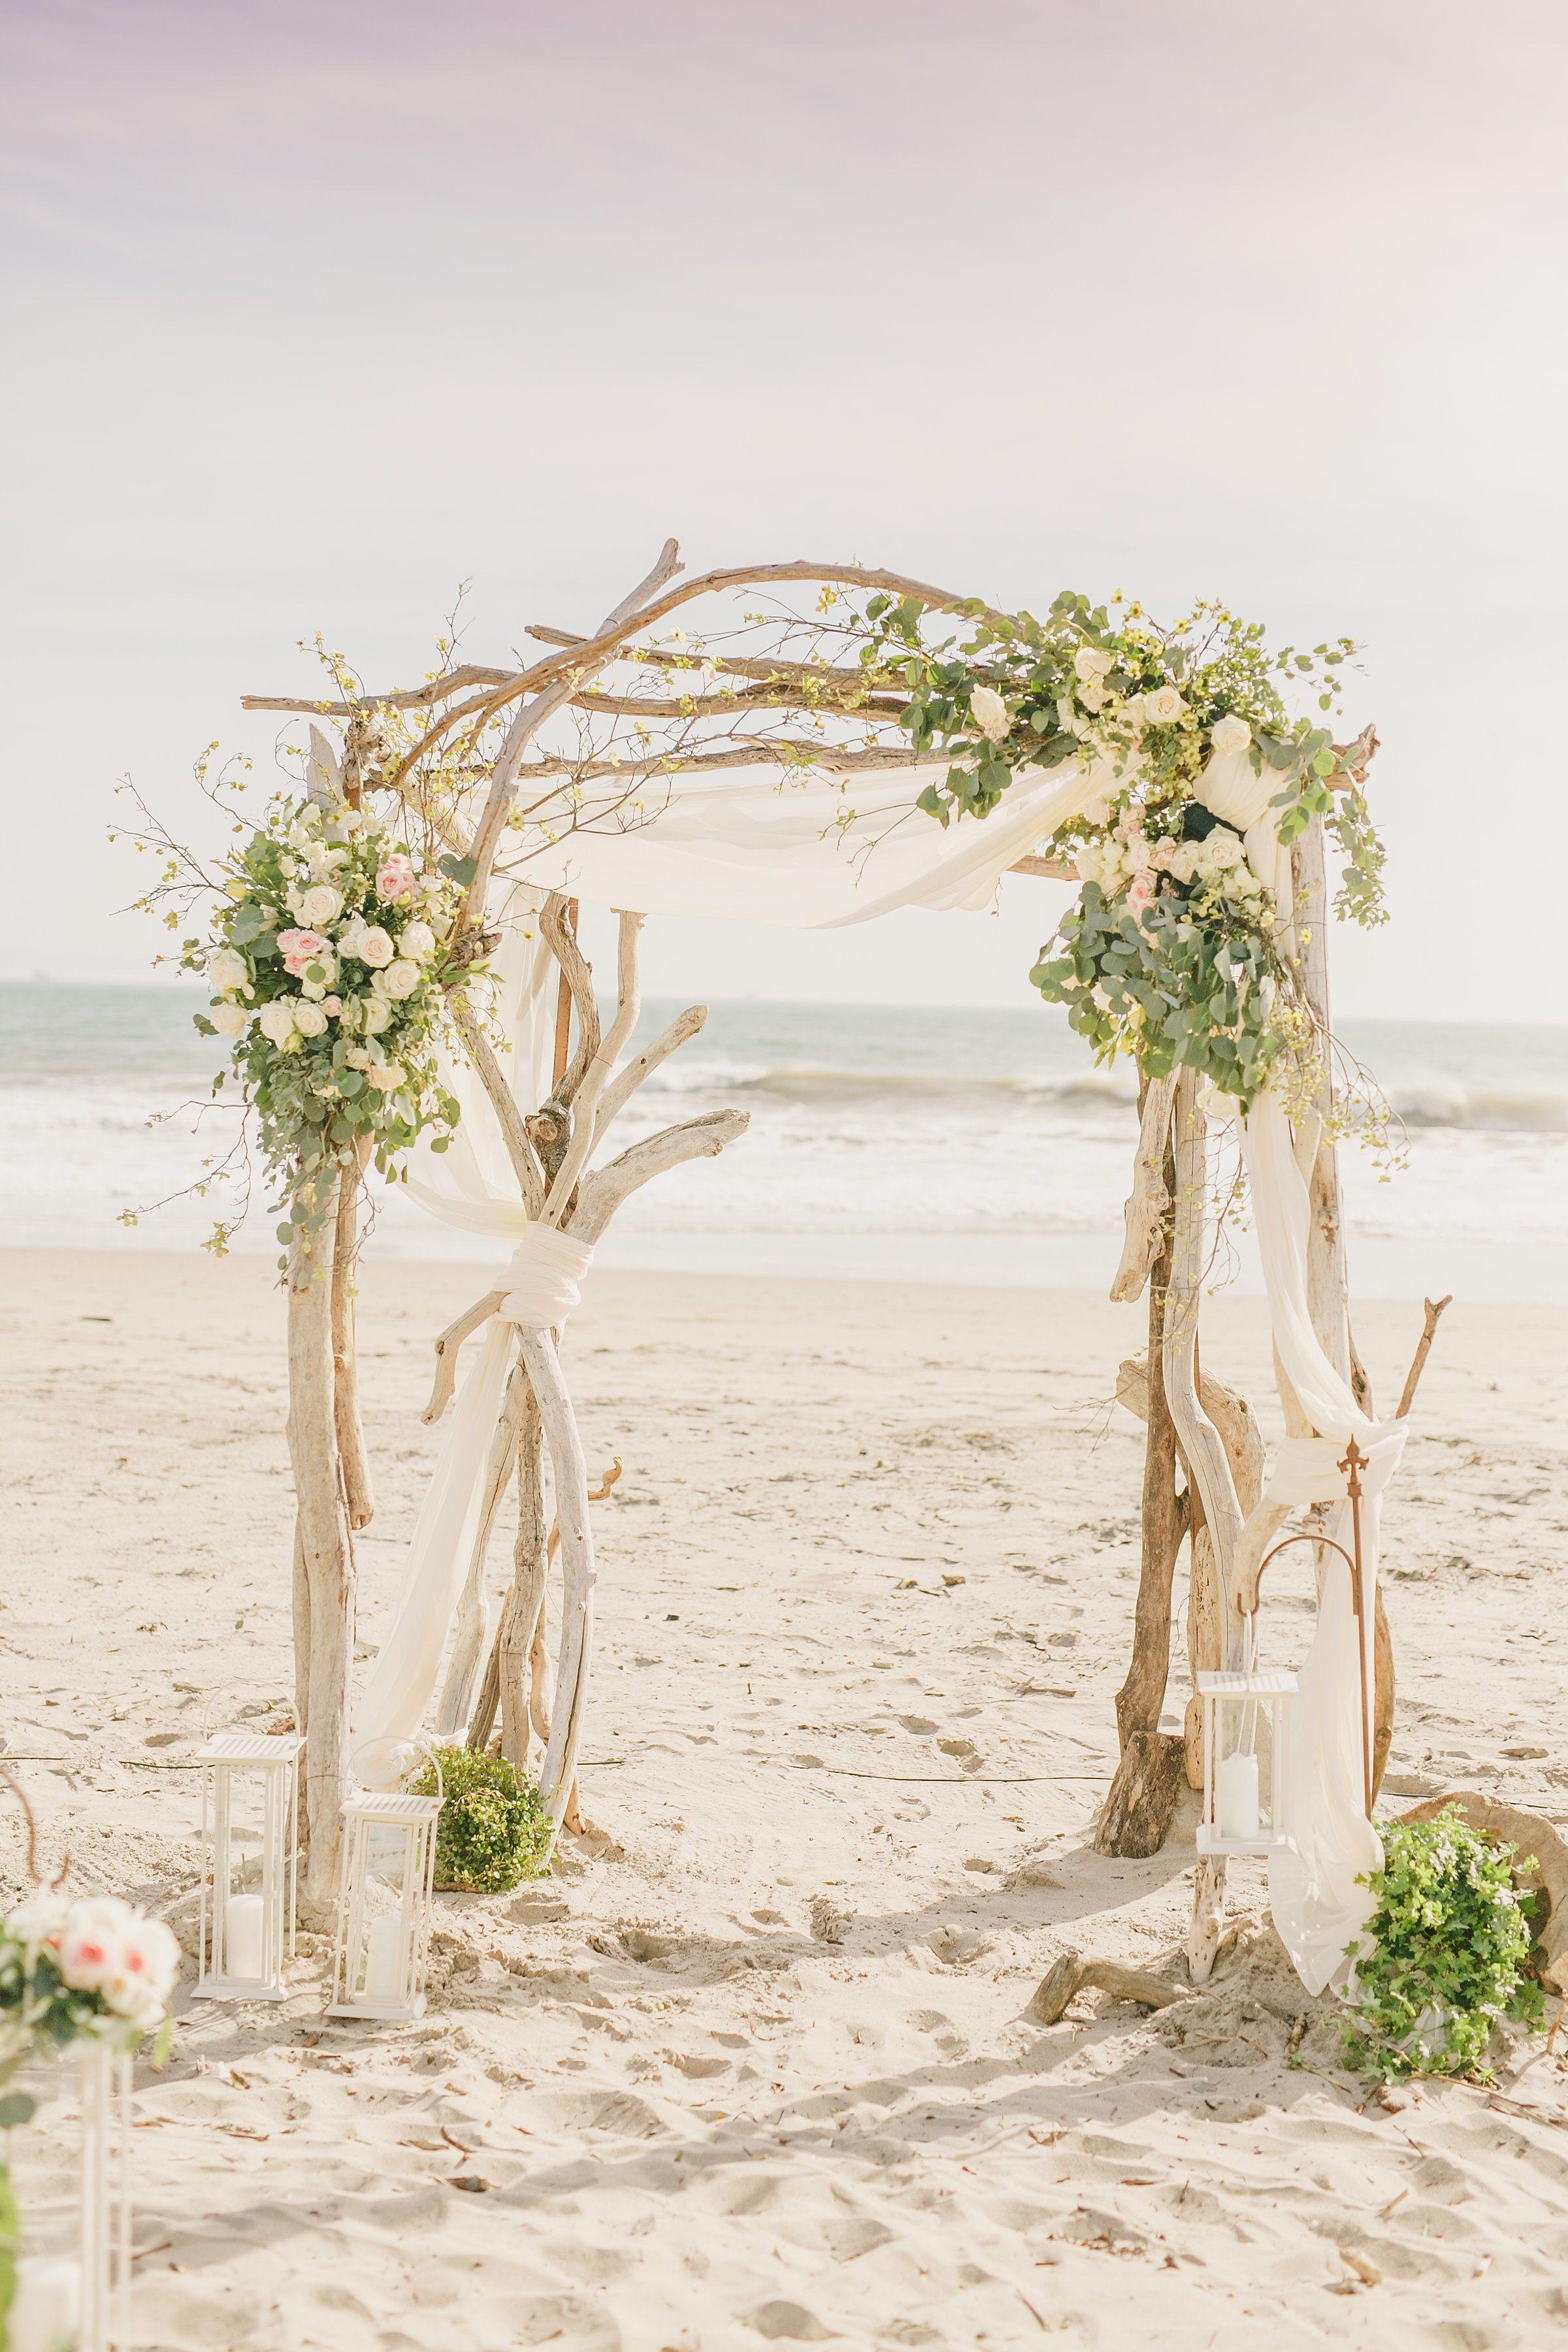 Ceremony Arch Idea For Beach Wedding Romantic Driftwood Wedding Arch Beach Wedding In Carpinteria Beach Wedding Arch Beach Wedding Photos Beach Theme Wedding